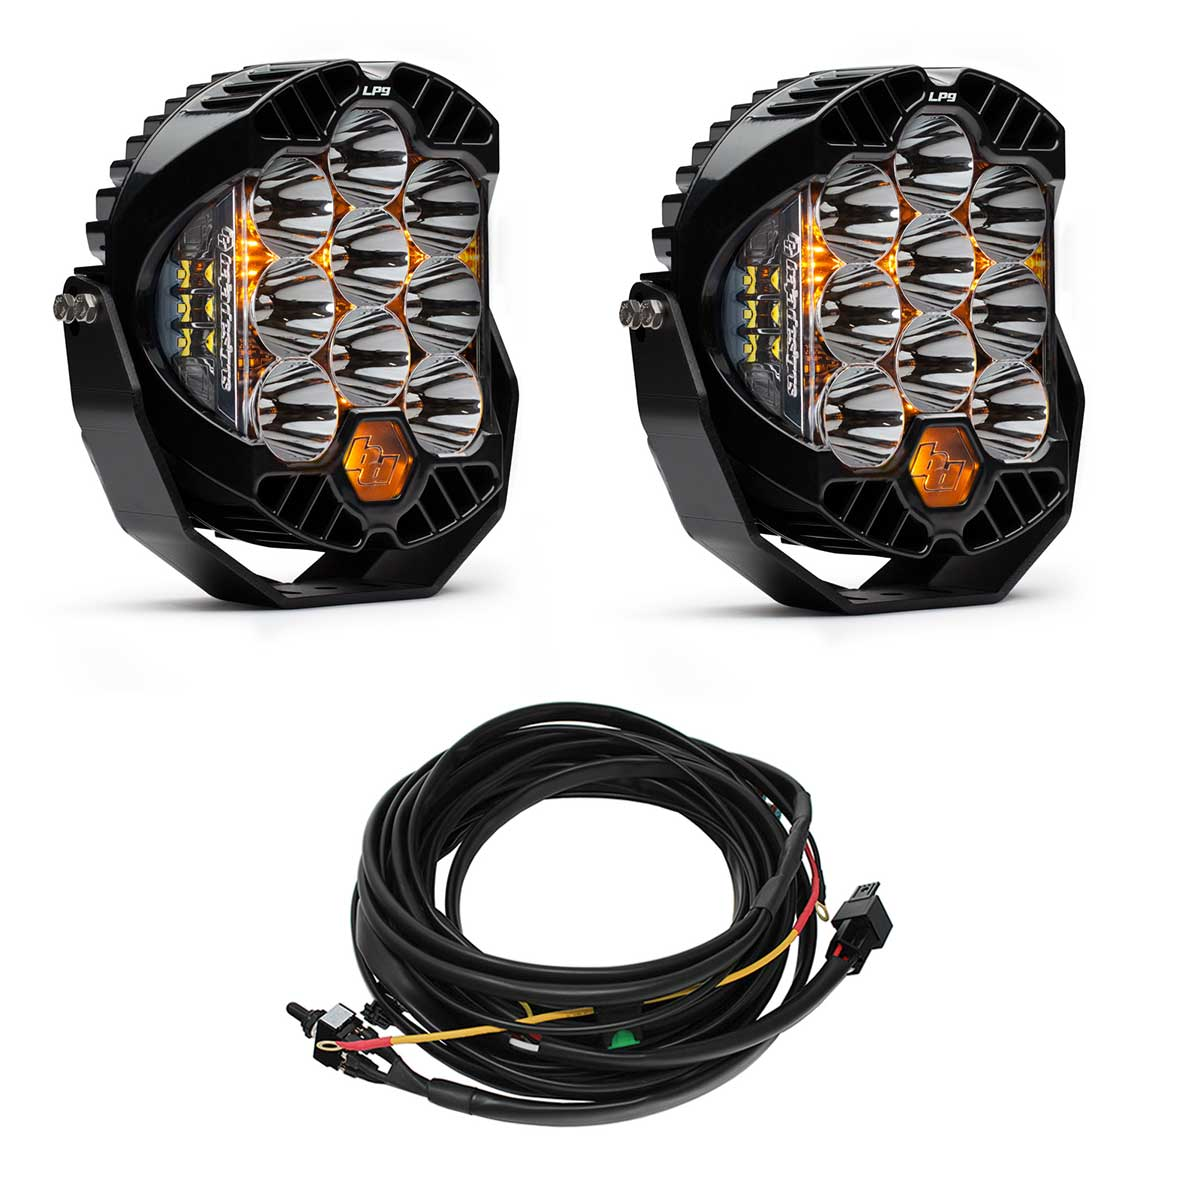 Totalzparts Baja Designs Pair Lp9 Pro Led Spot Lights Harness Kit Fog Light